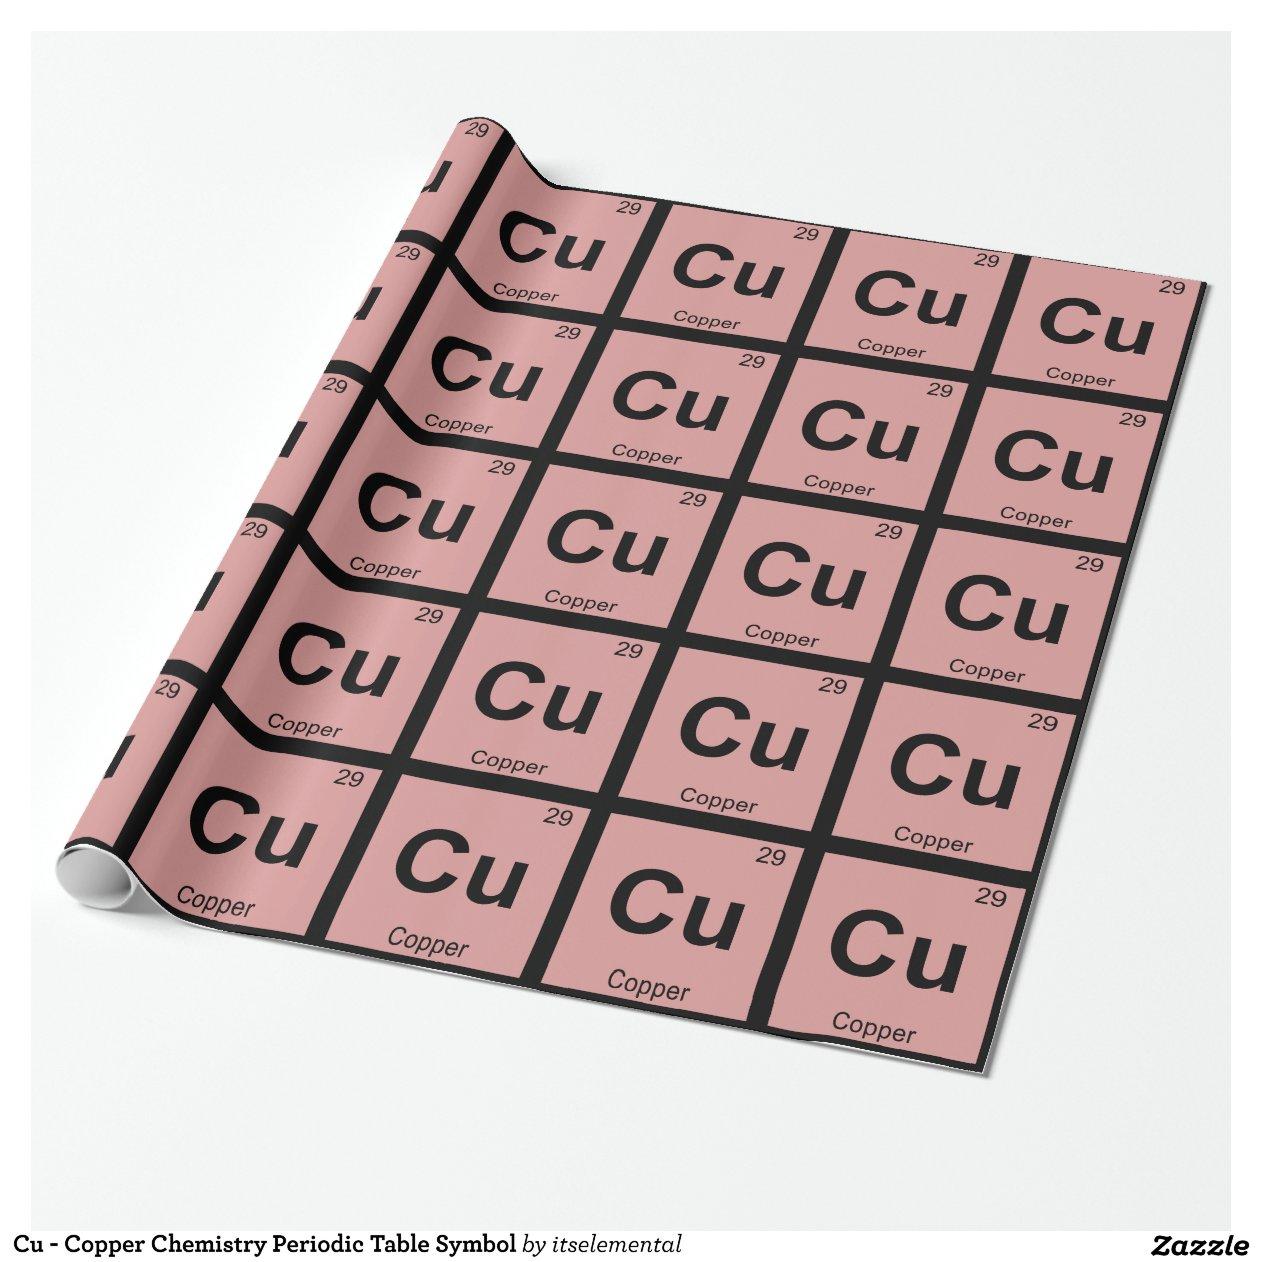 Copper periodic table symbol gallery periodic table images periodic table symbol for copper k kub 2017 gamestrikefo gallery gamestrikefo Choice Image